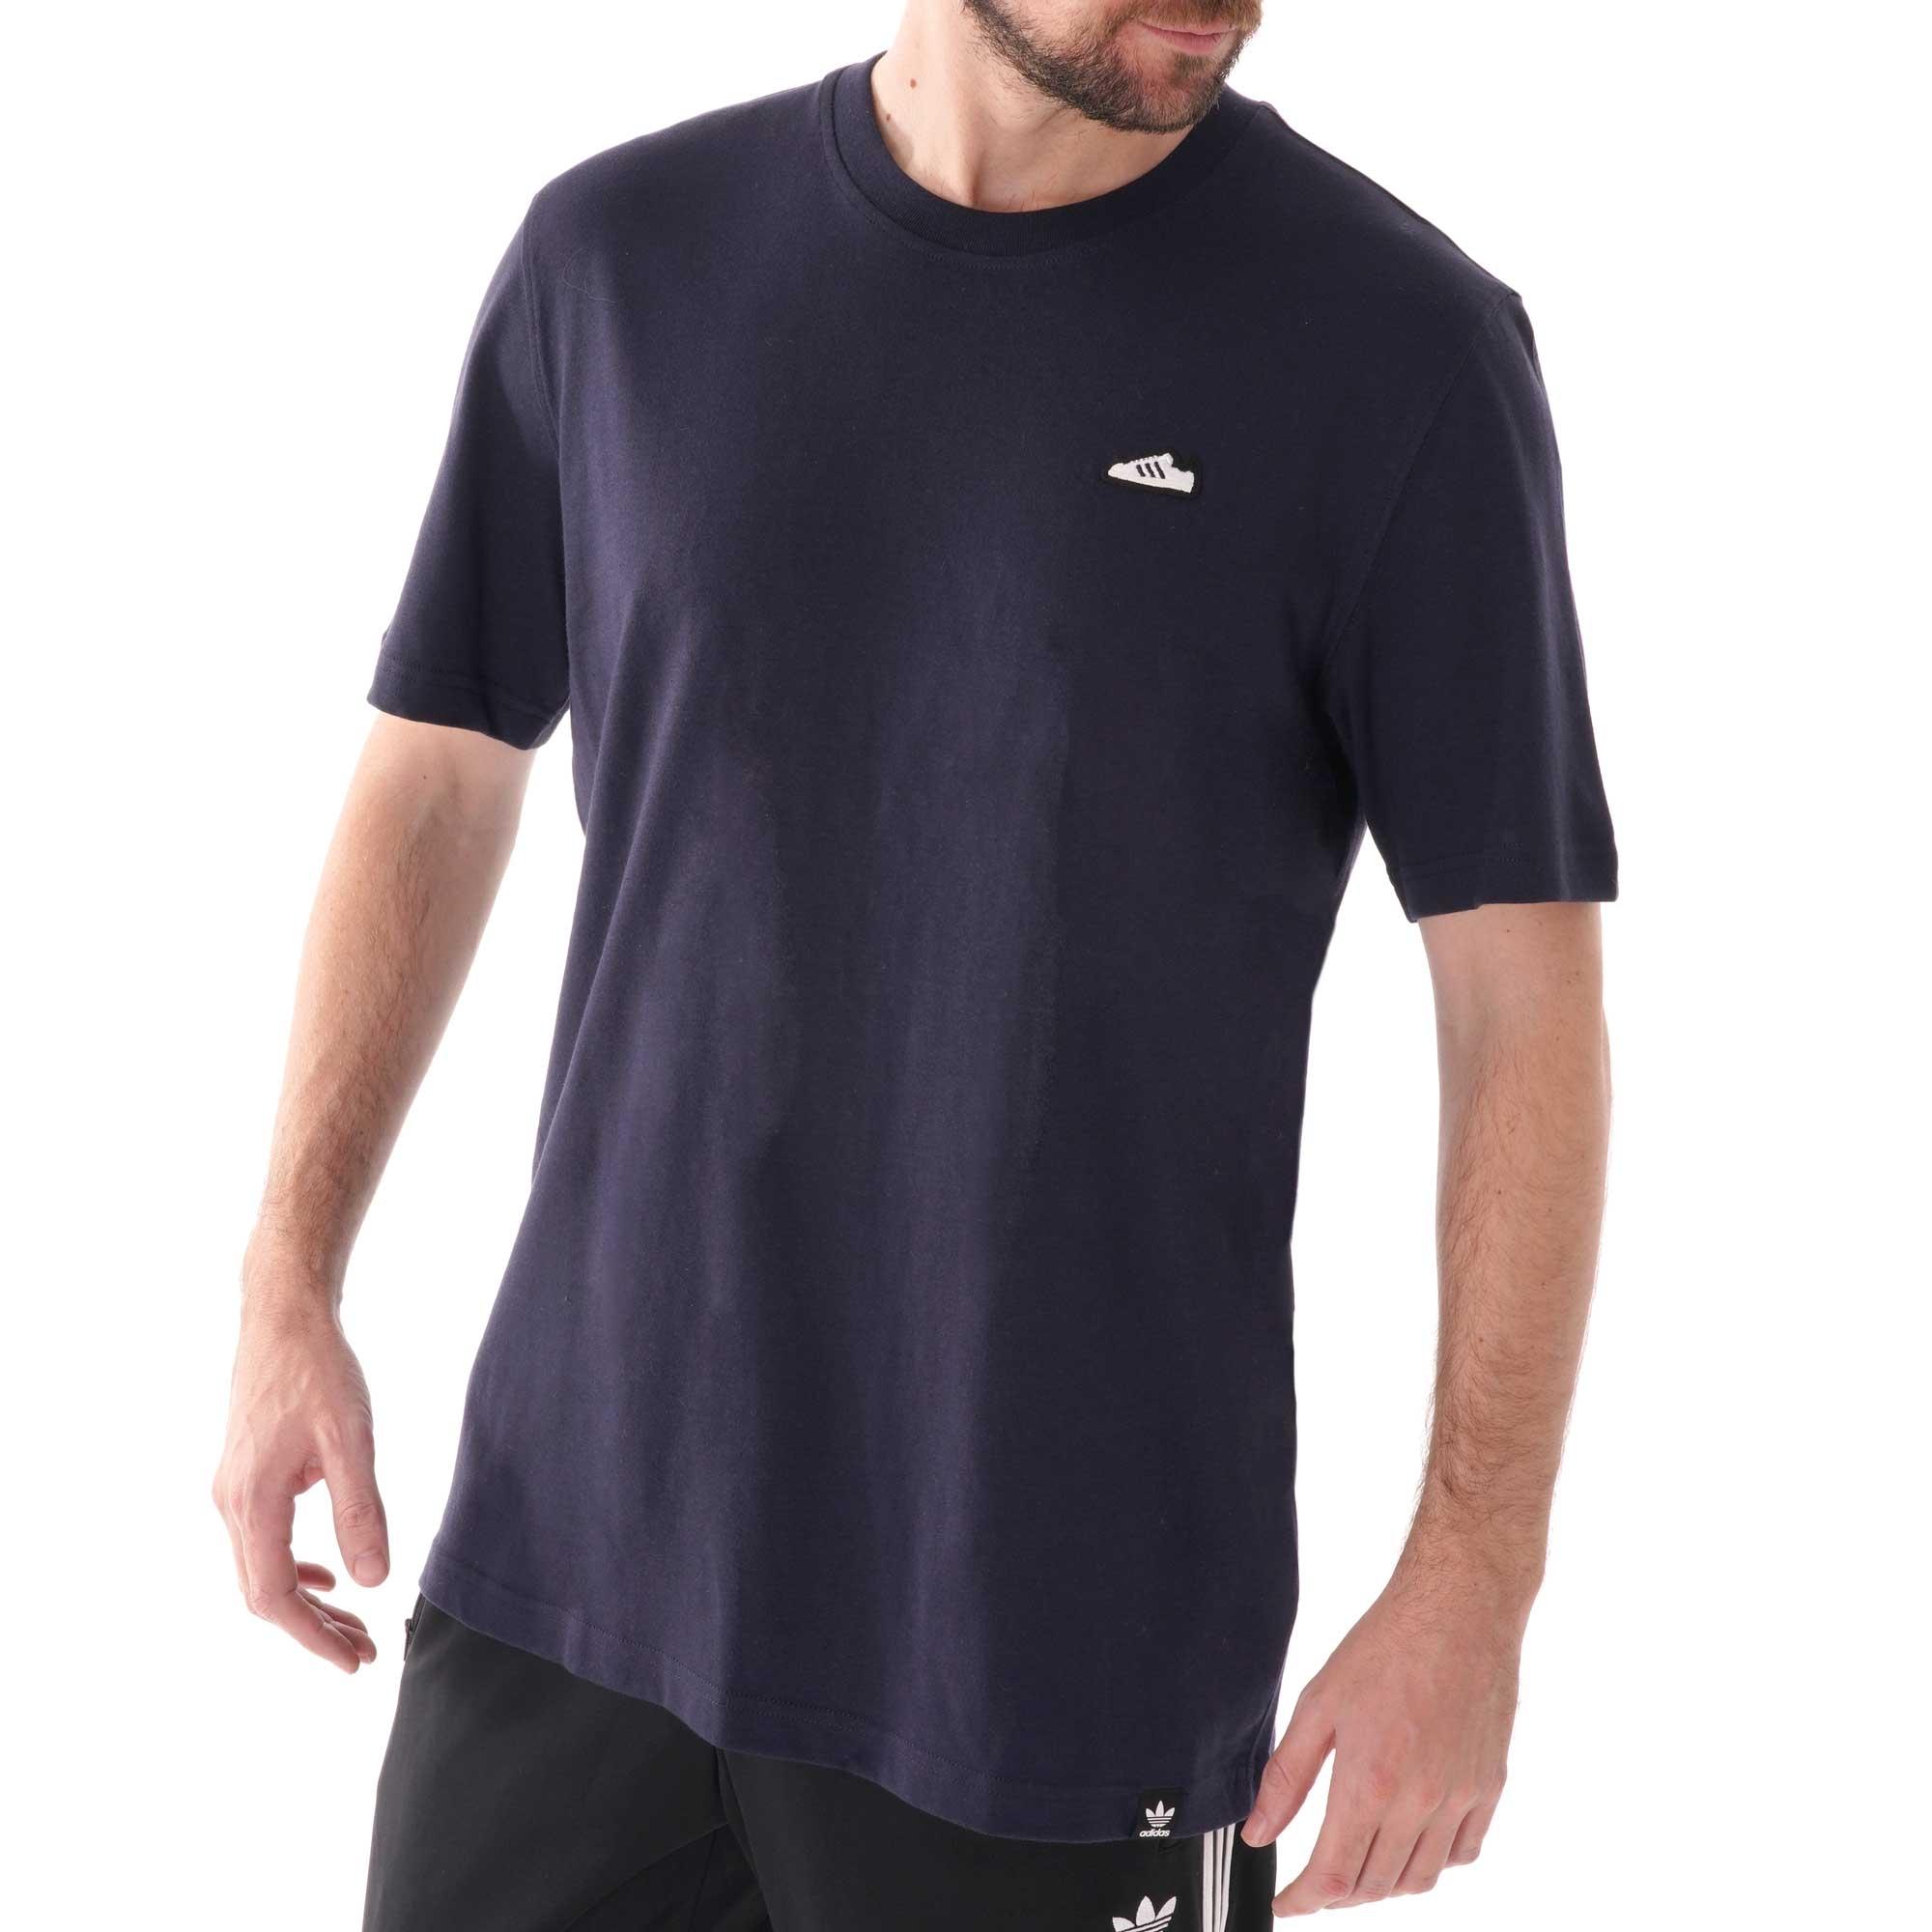 Adidas Originals Embroidered Sneaker T Shirt Navy (FM3377)